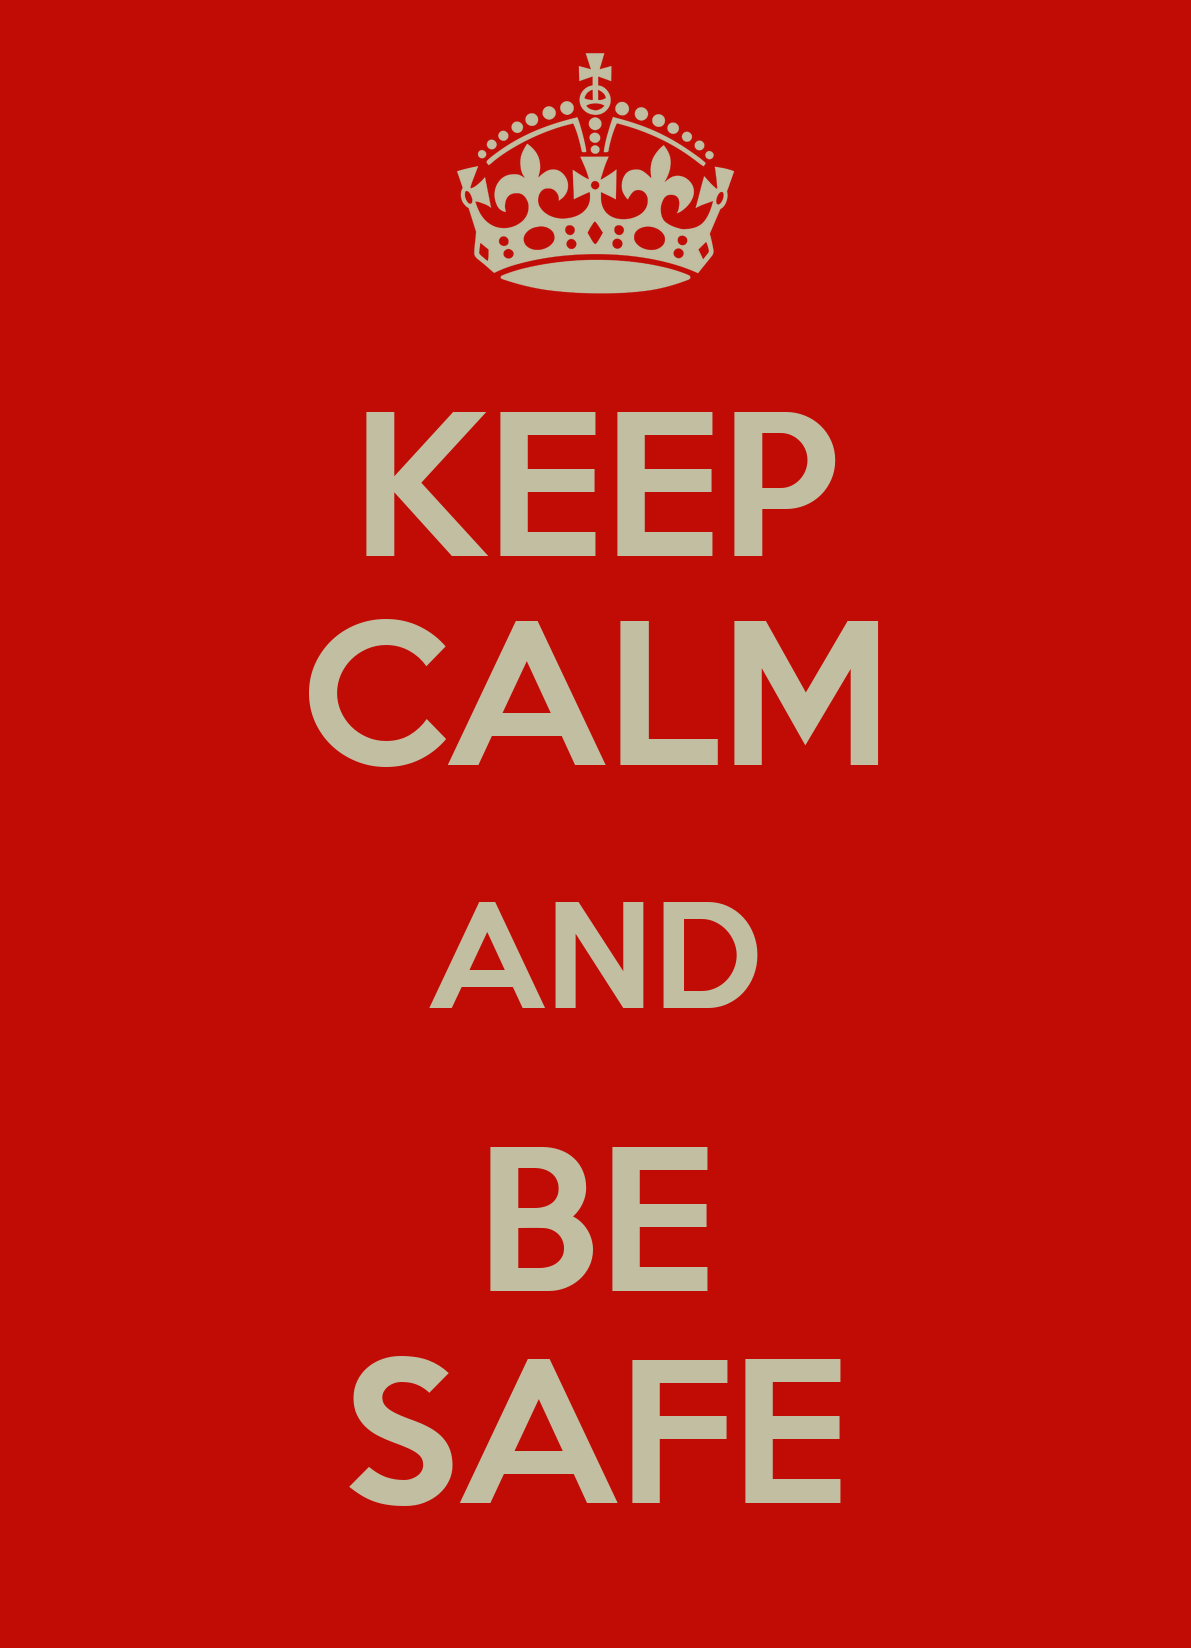 KEEP CALM AND BE SAFE Poster | Zaiyd | Keep Calm-o-Matic